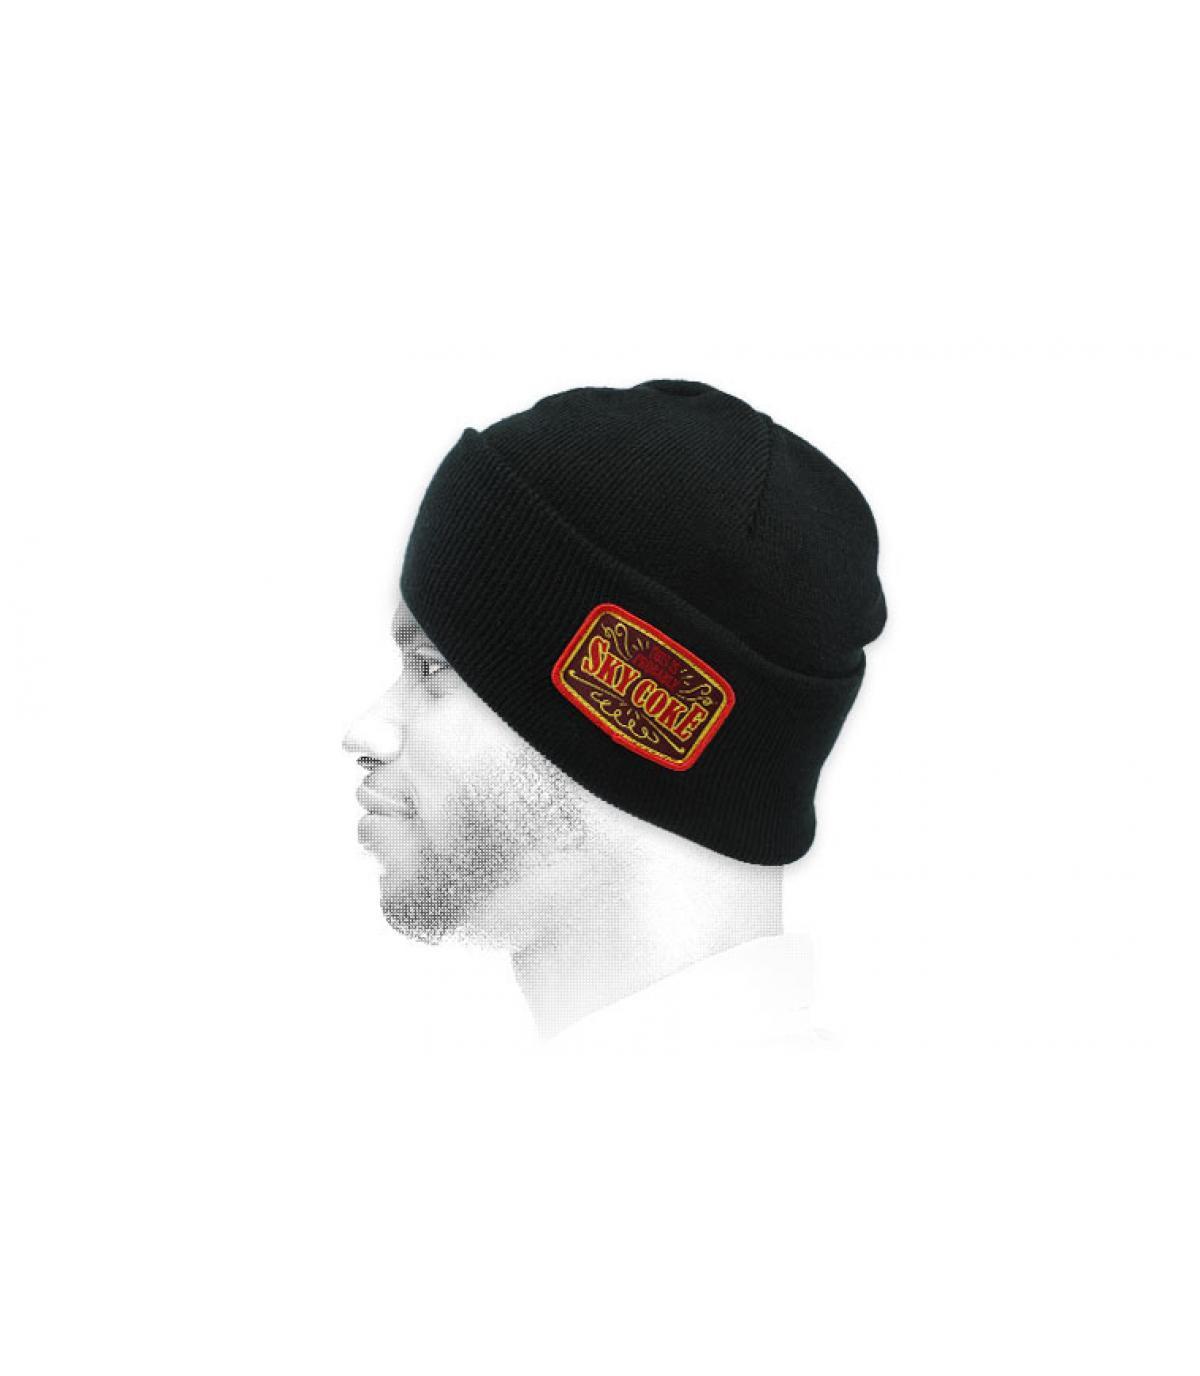 Mütze Sky Coke schwarz